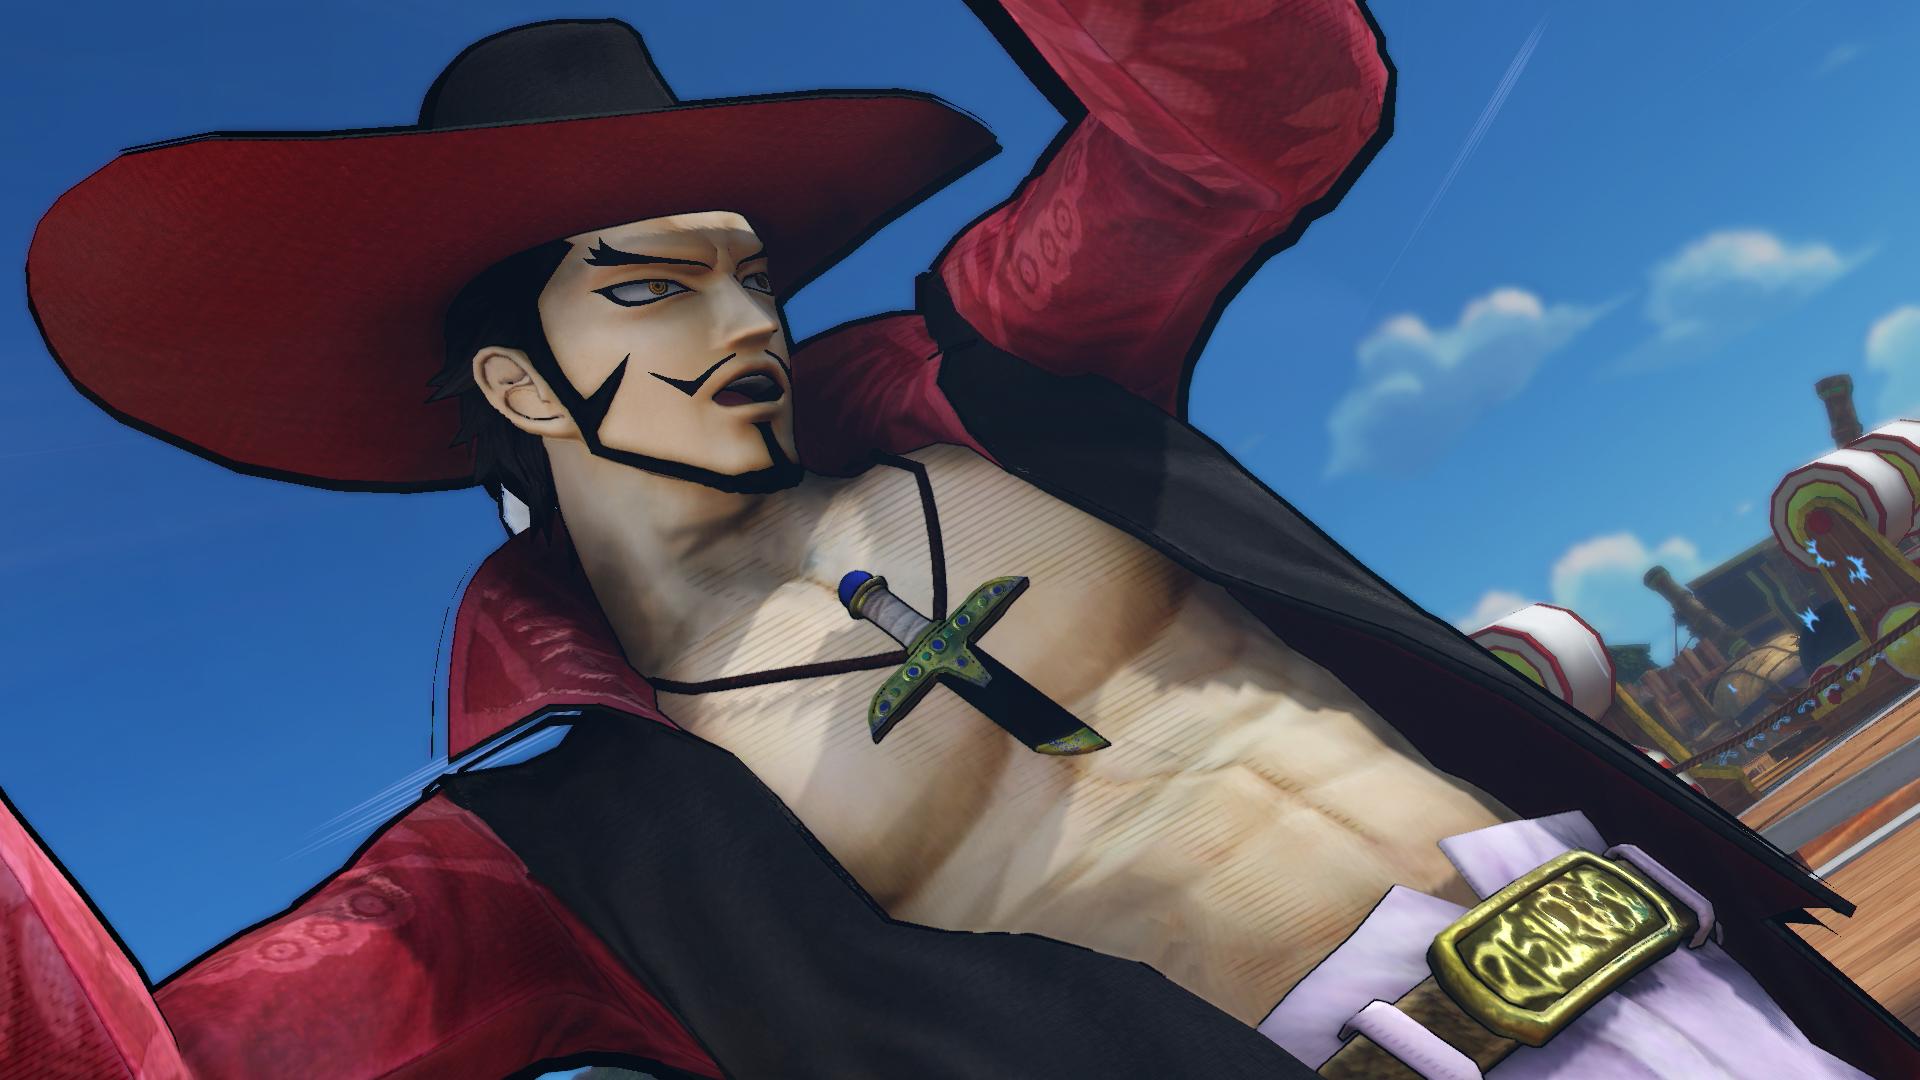 One_Piece_Pirate_Warriors_3_04.jpg